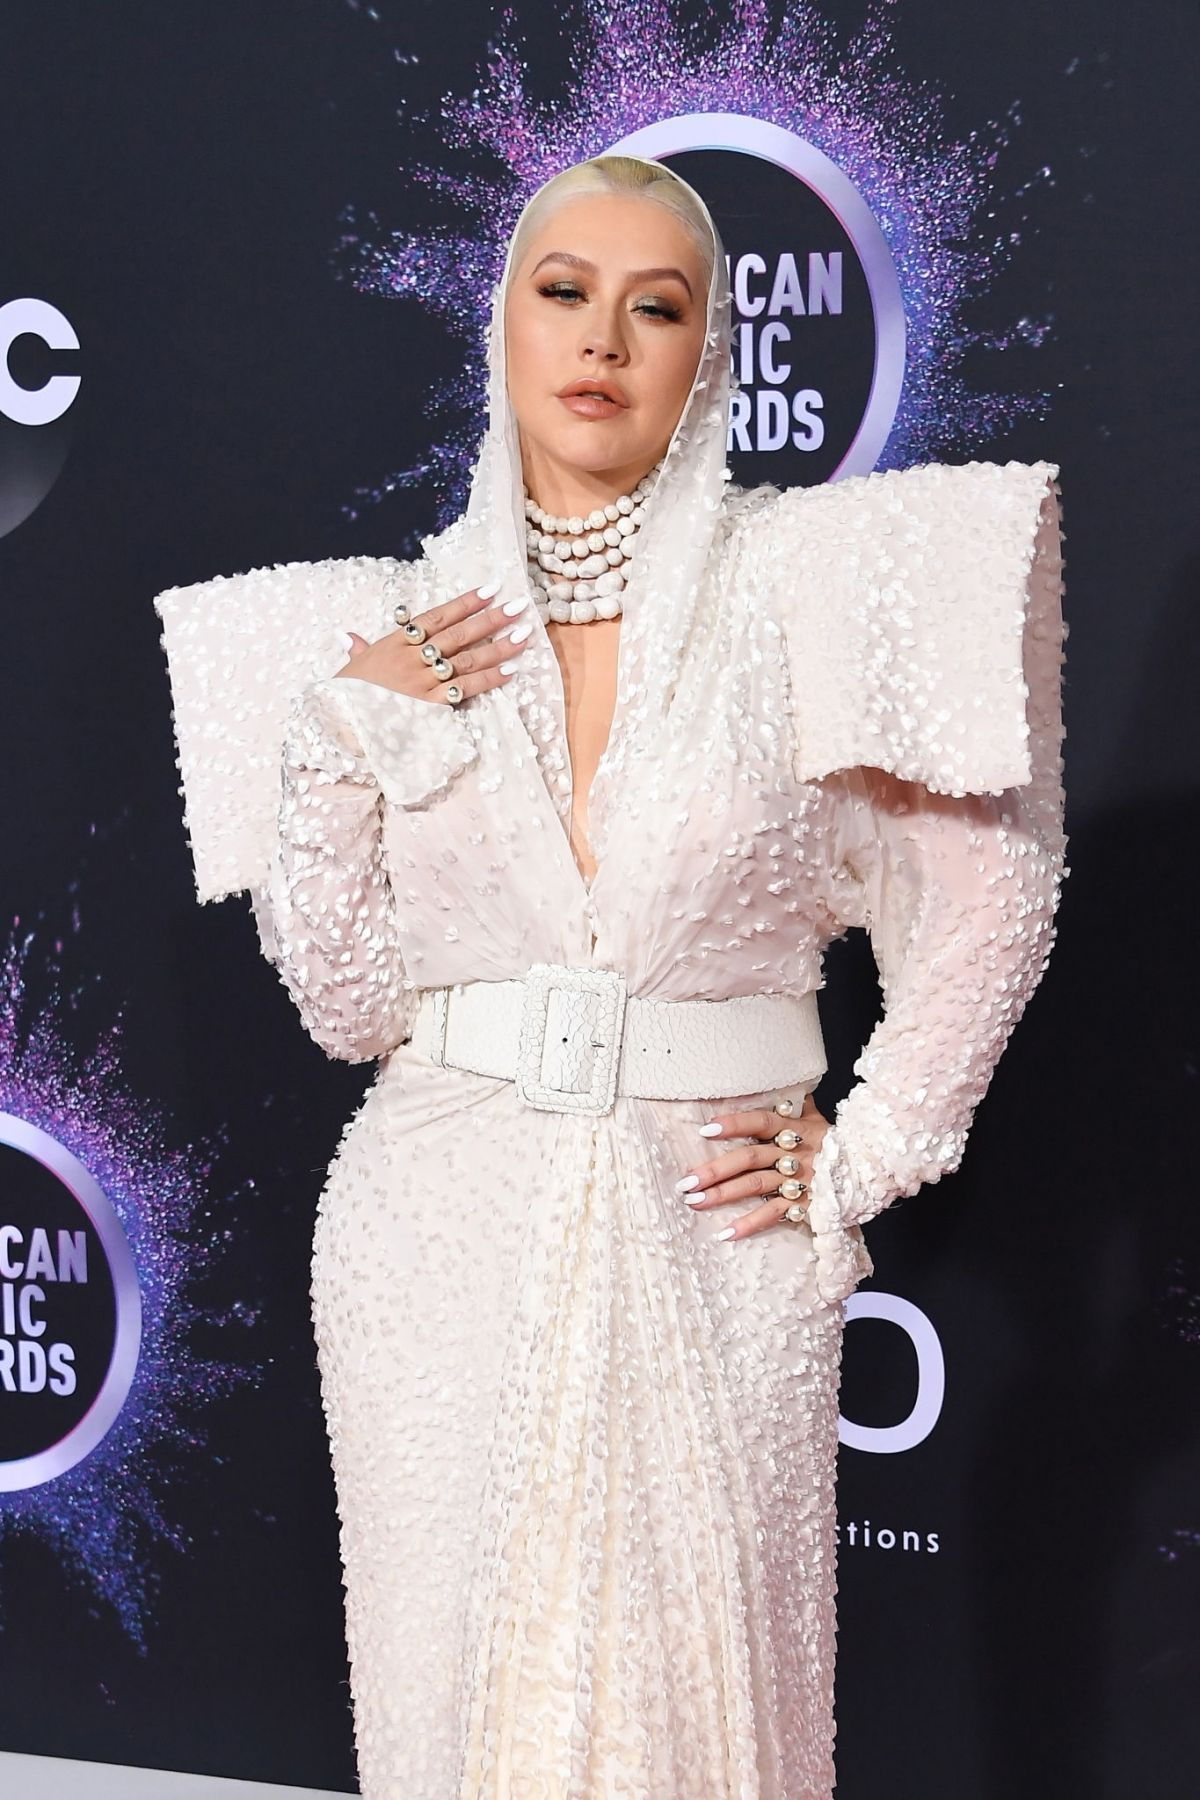 Jennifer Lopezs fashion & style, by stylists Rob & Mariel